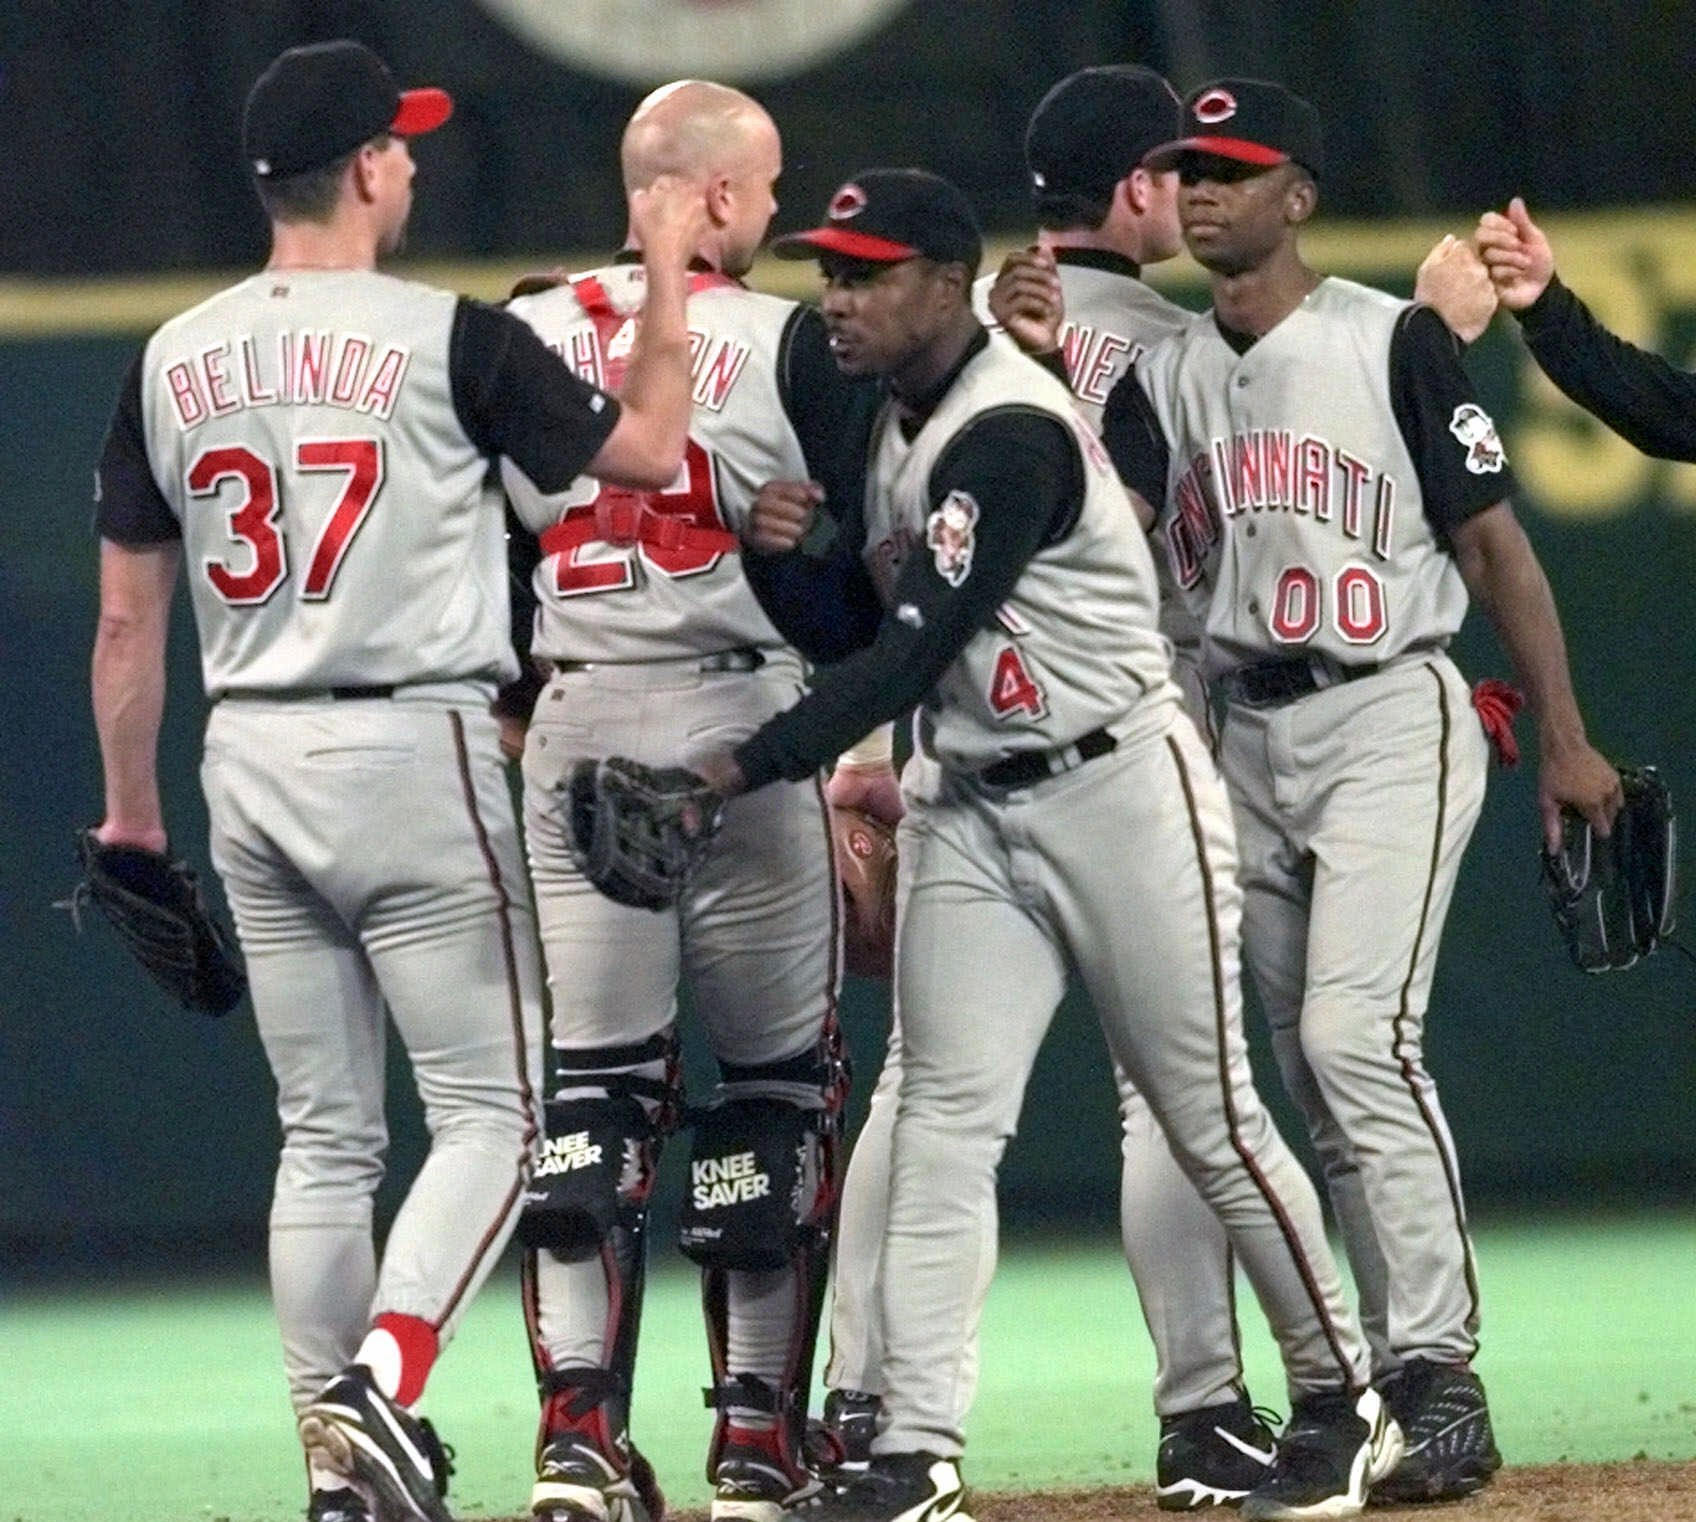 GALLERY: Cincinnati Reds have a nine homer night vs. Philadelphia Phillies on Sept. 4, 1999